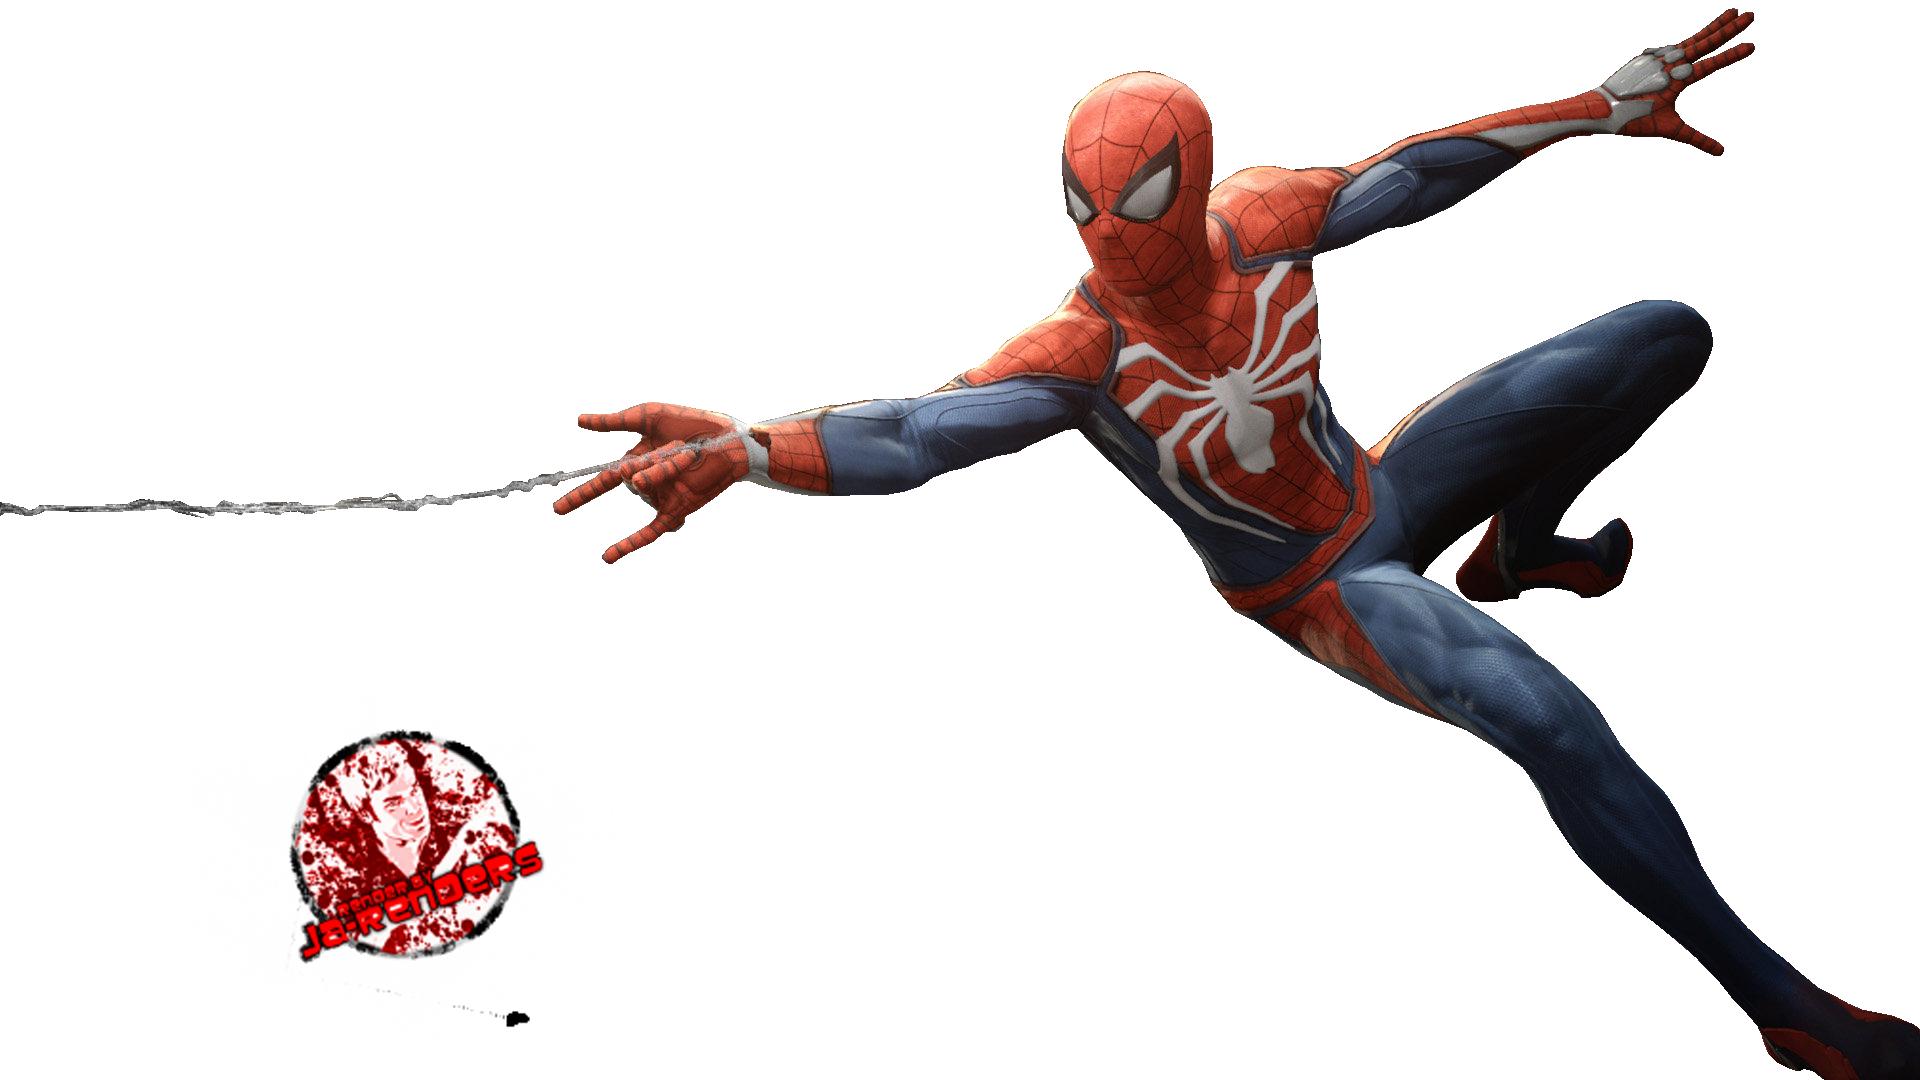 spider-man | the crossover game wikia | fandom poweredwikia